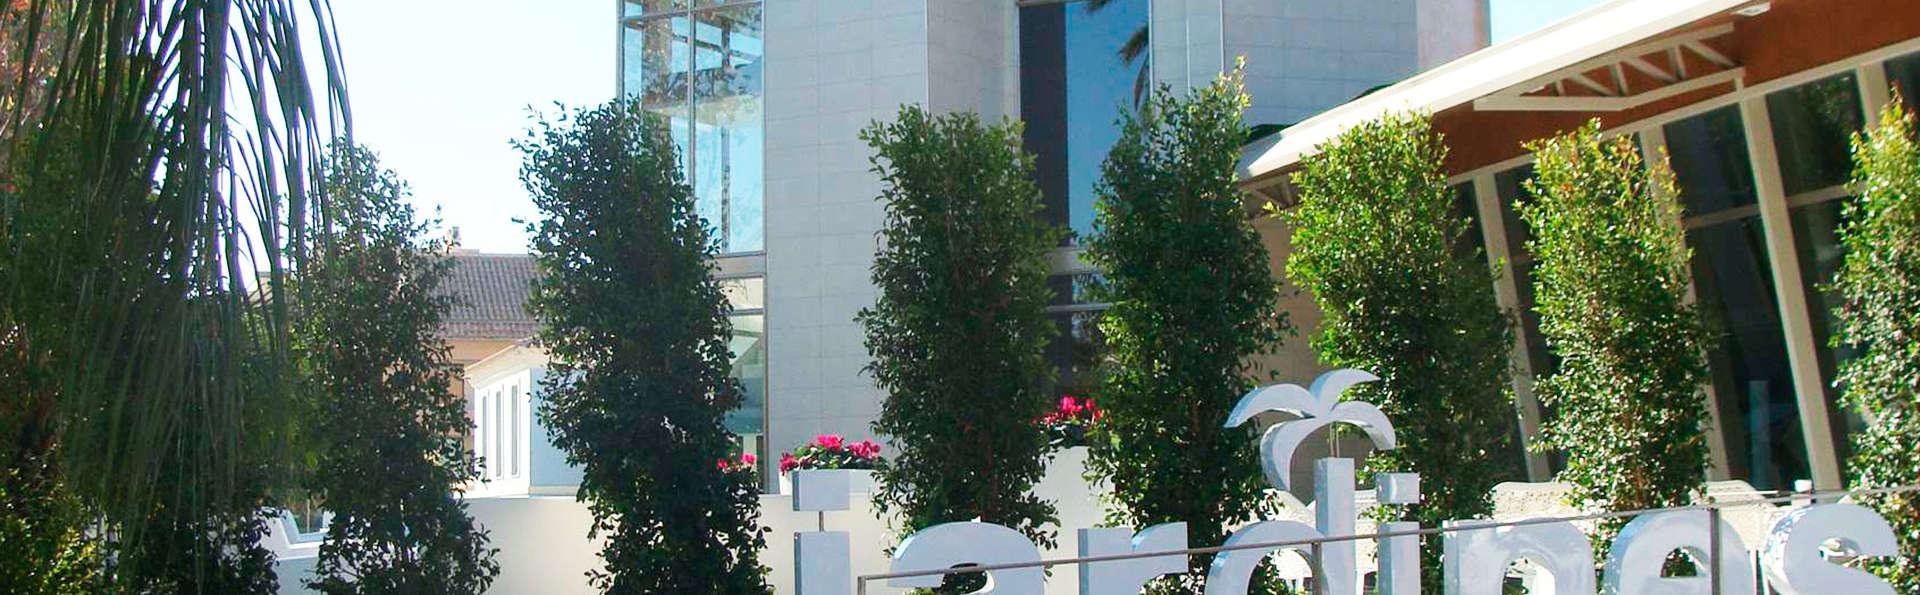 Hotel spa jardines de lorca 4 lorca espa a for Hotel spa jardines de lorca lorca